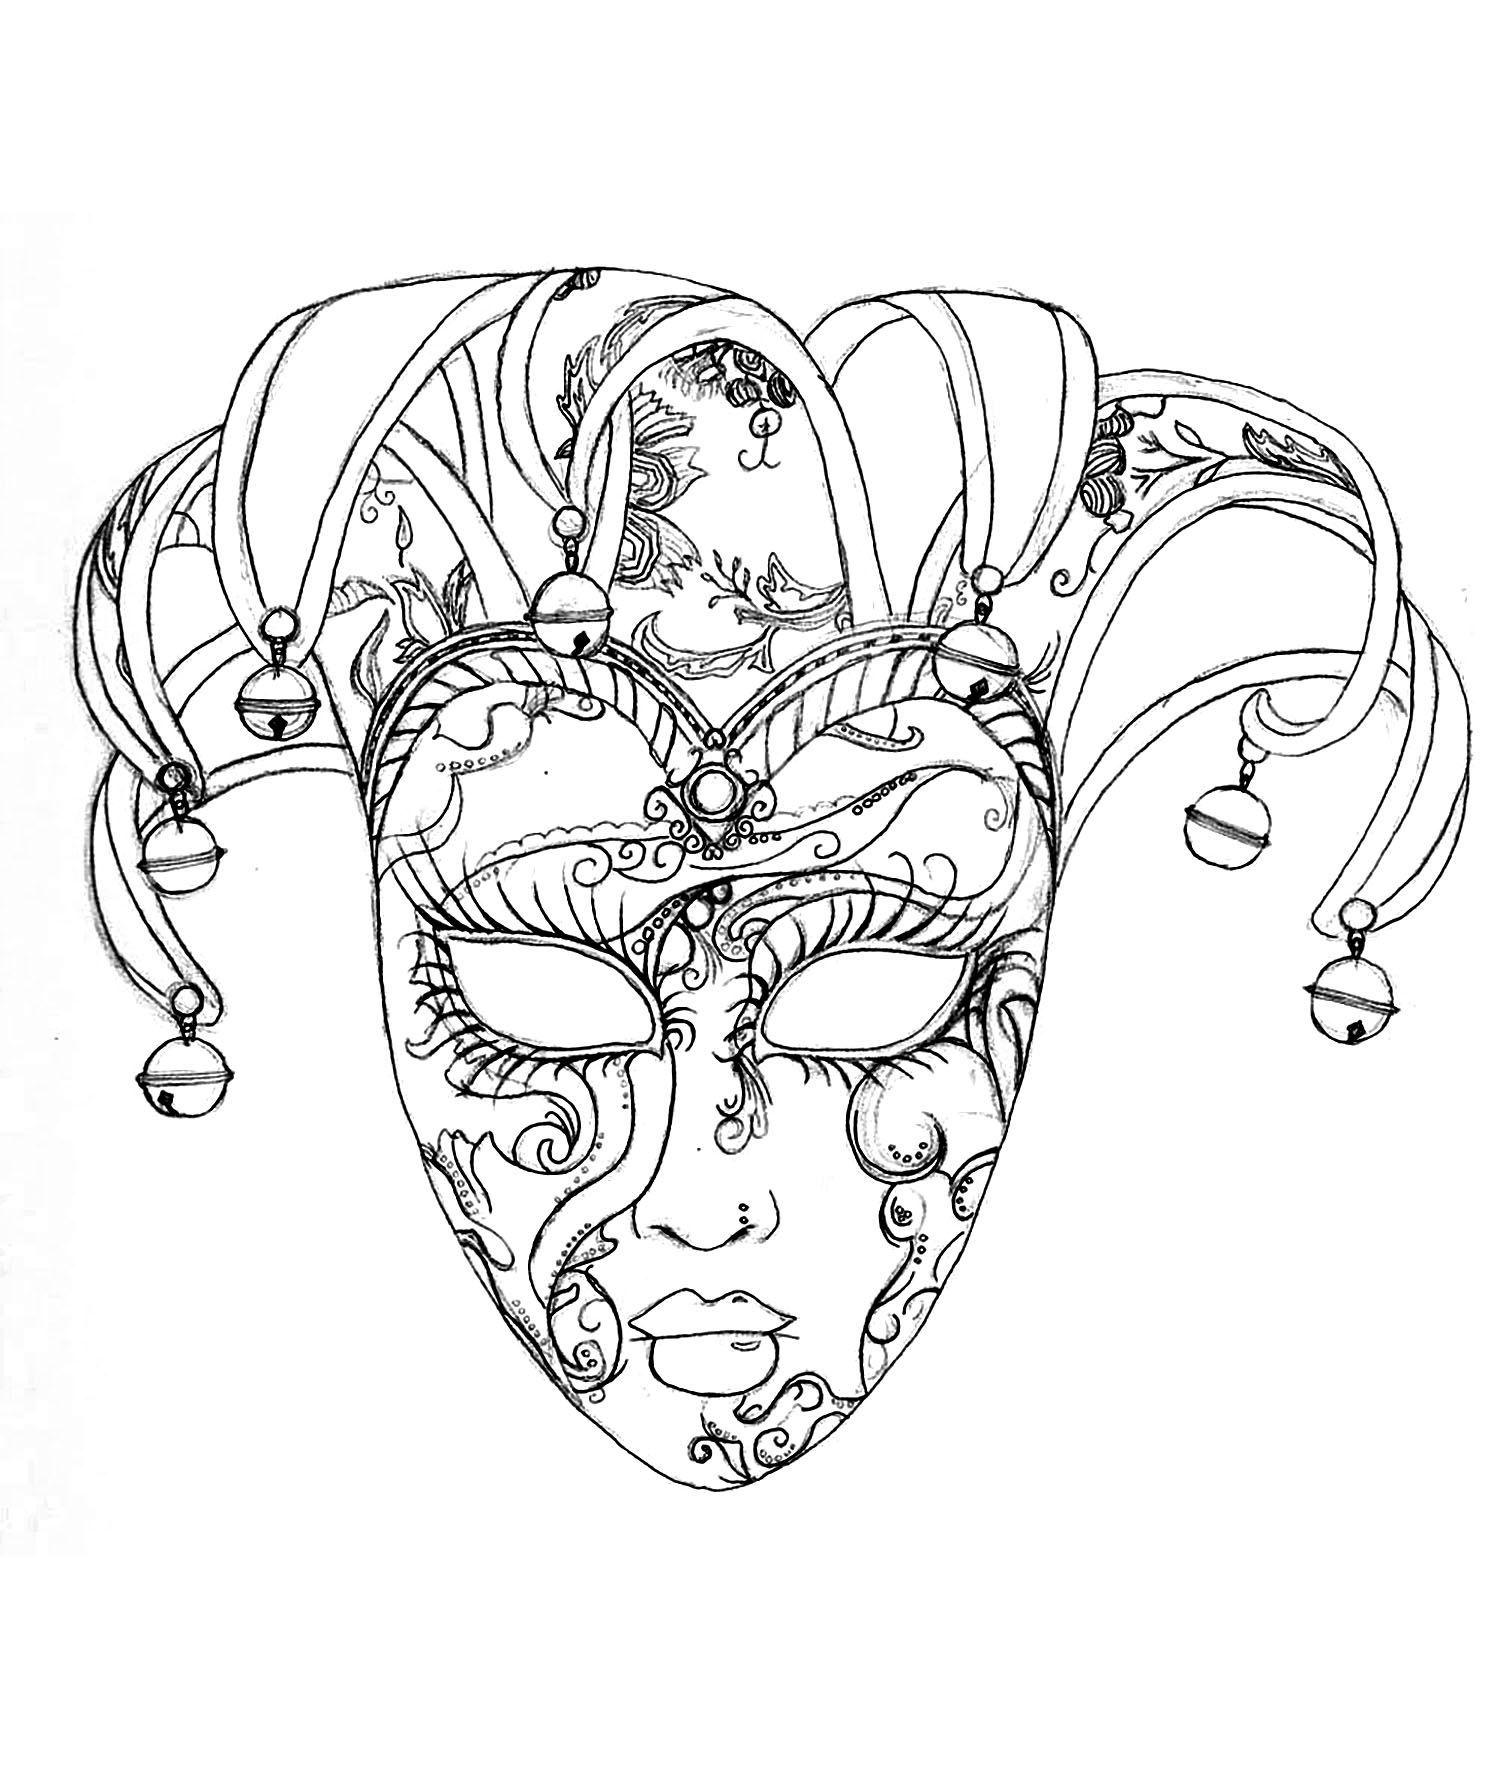 Mandala Fasching Maske  50 Faschingsbilder Zum Ausdrucken